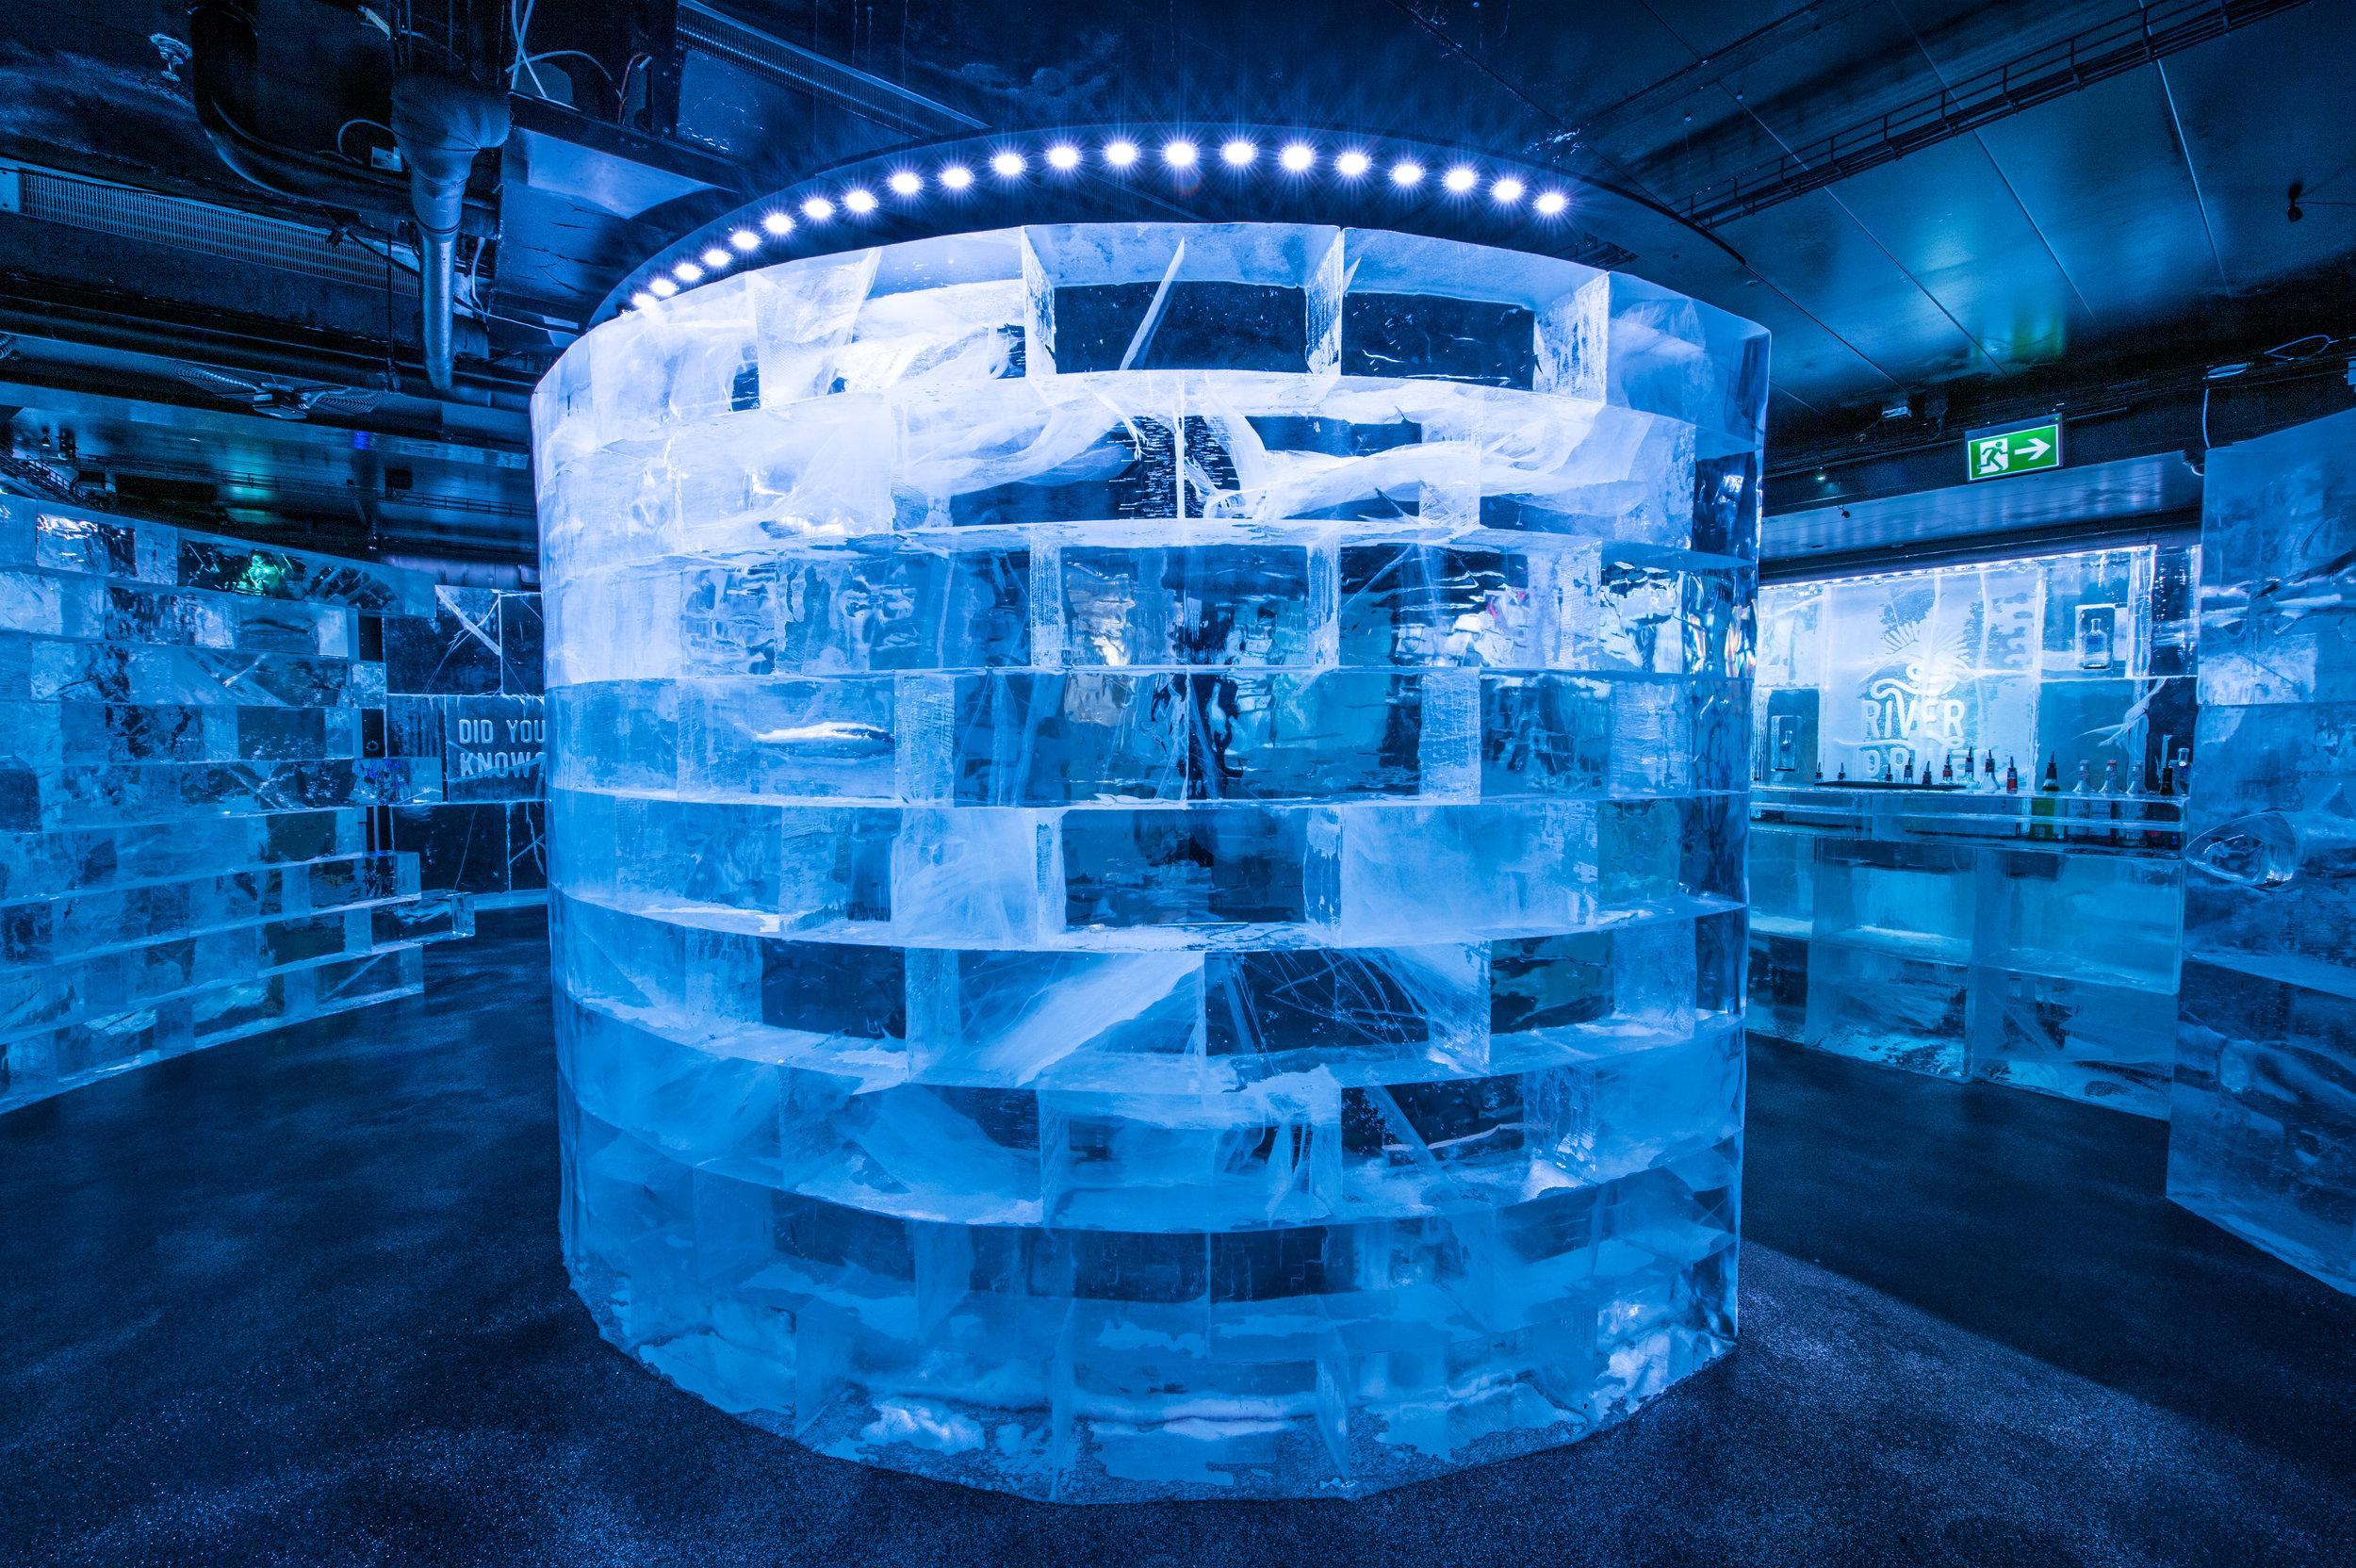 ICEBAR 2017 - Kalle Ekeroth, John Pettersson, Tjåsa Lucia Gusfors, Jon Nilsson, Mats Nilsson ,Mattias Eriksson. - by Asaf Kliger (4 of 16).jpg